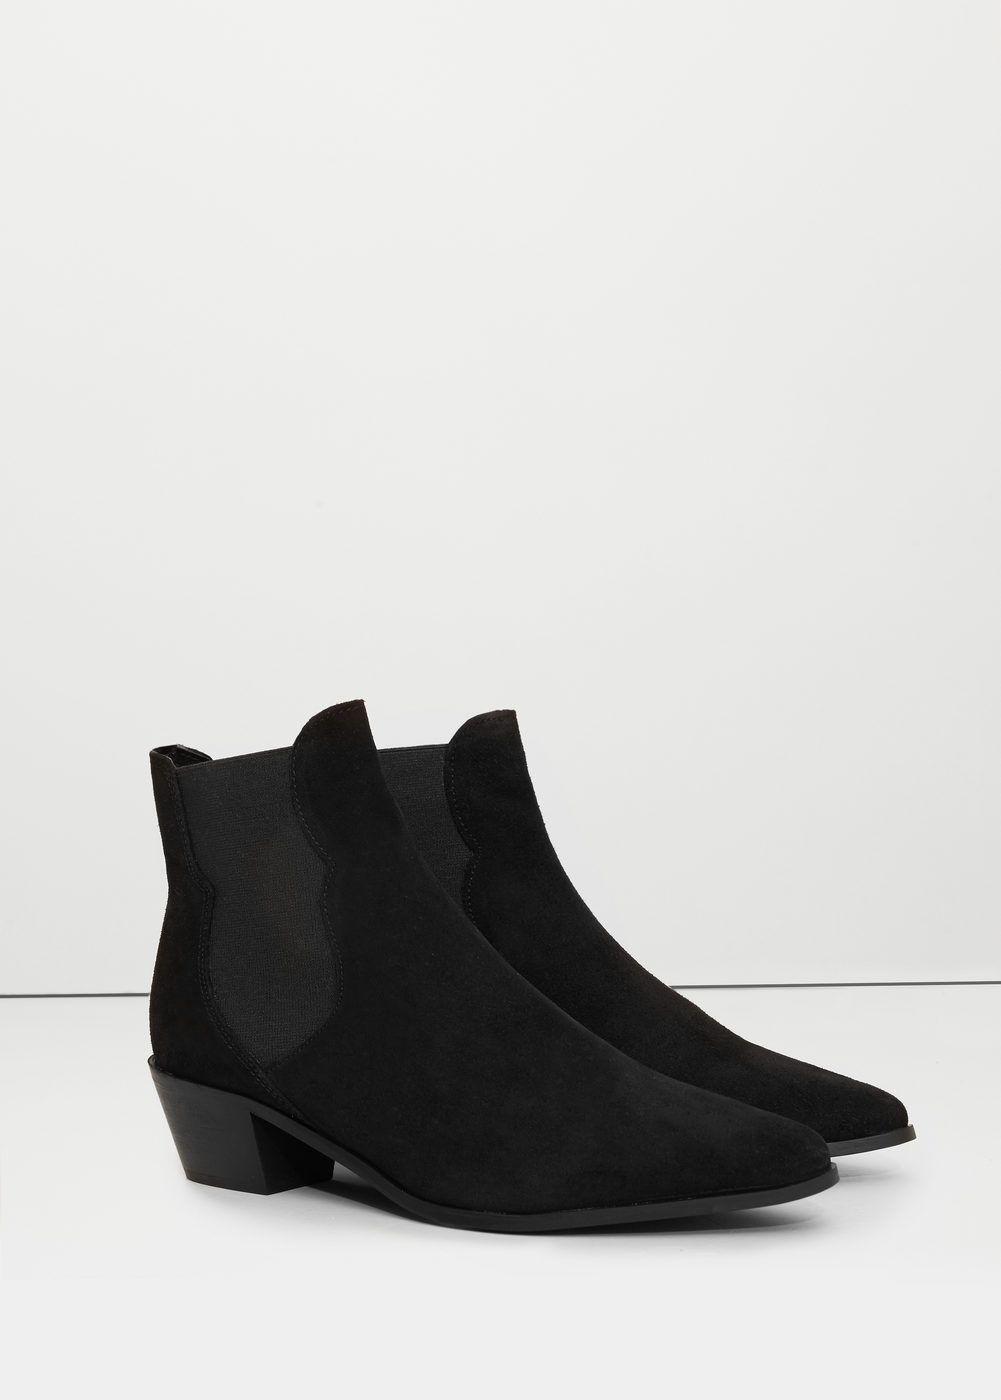 Piel Mujer Chelsea Wishlist Zapatos Pinterest Endless Botín qpSwx656